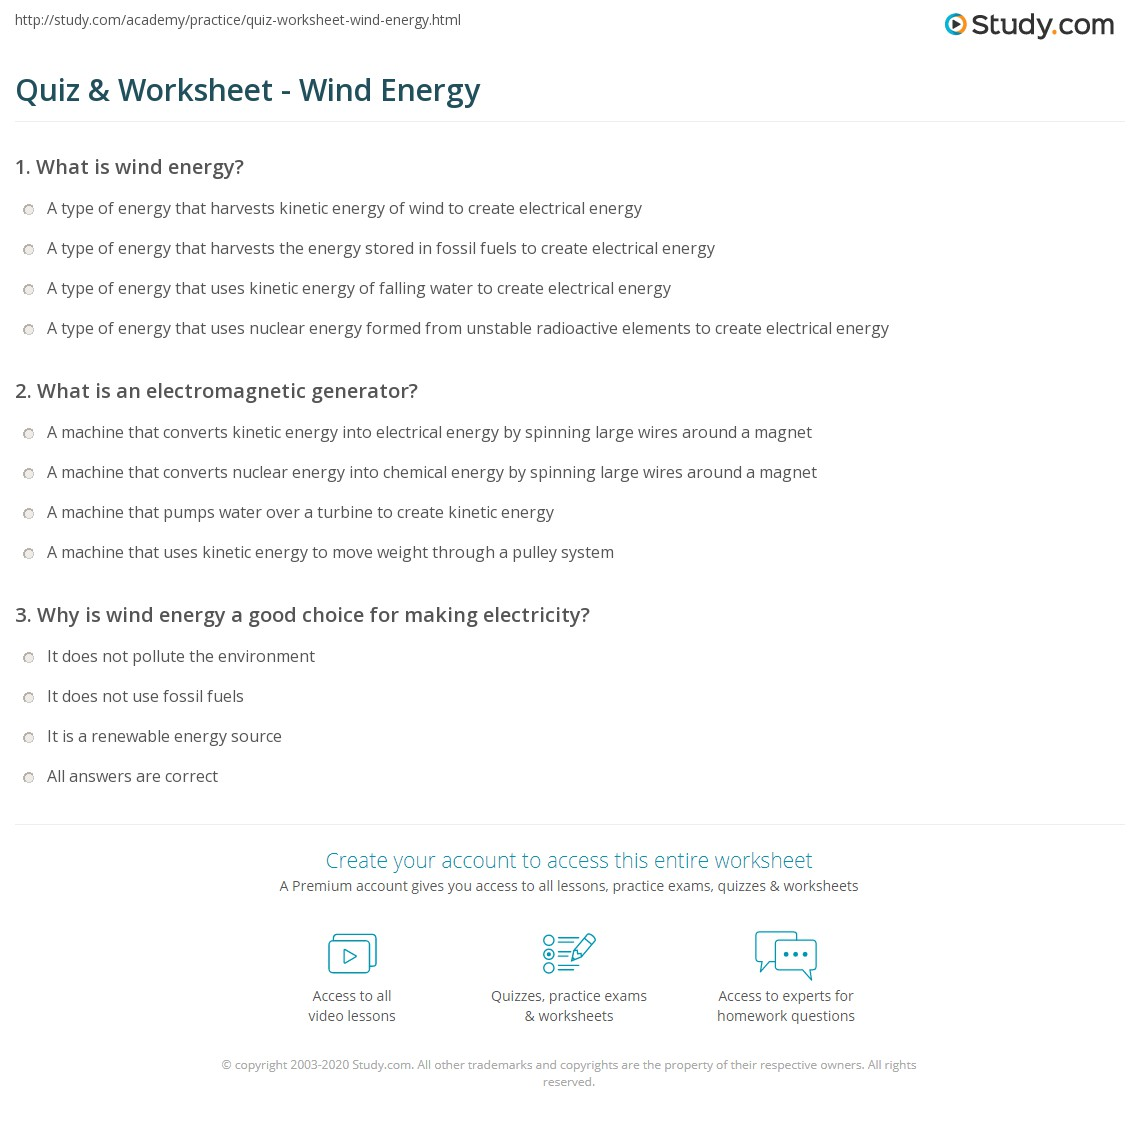 Quiz W Ksheet W D Energy Study